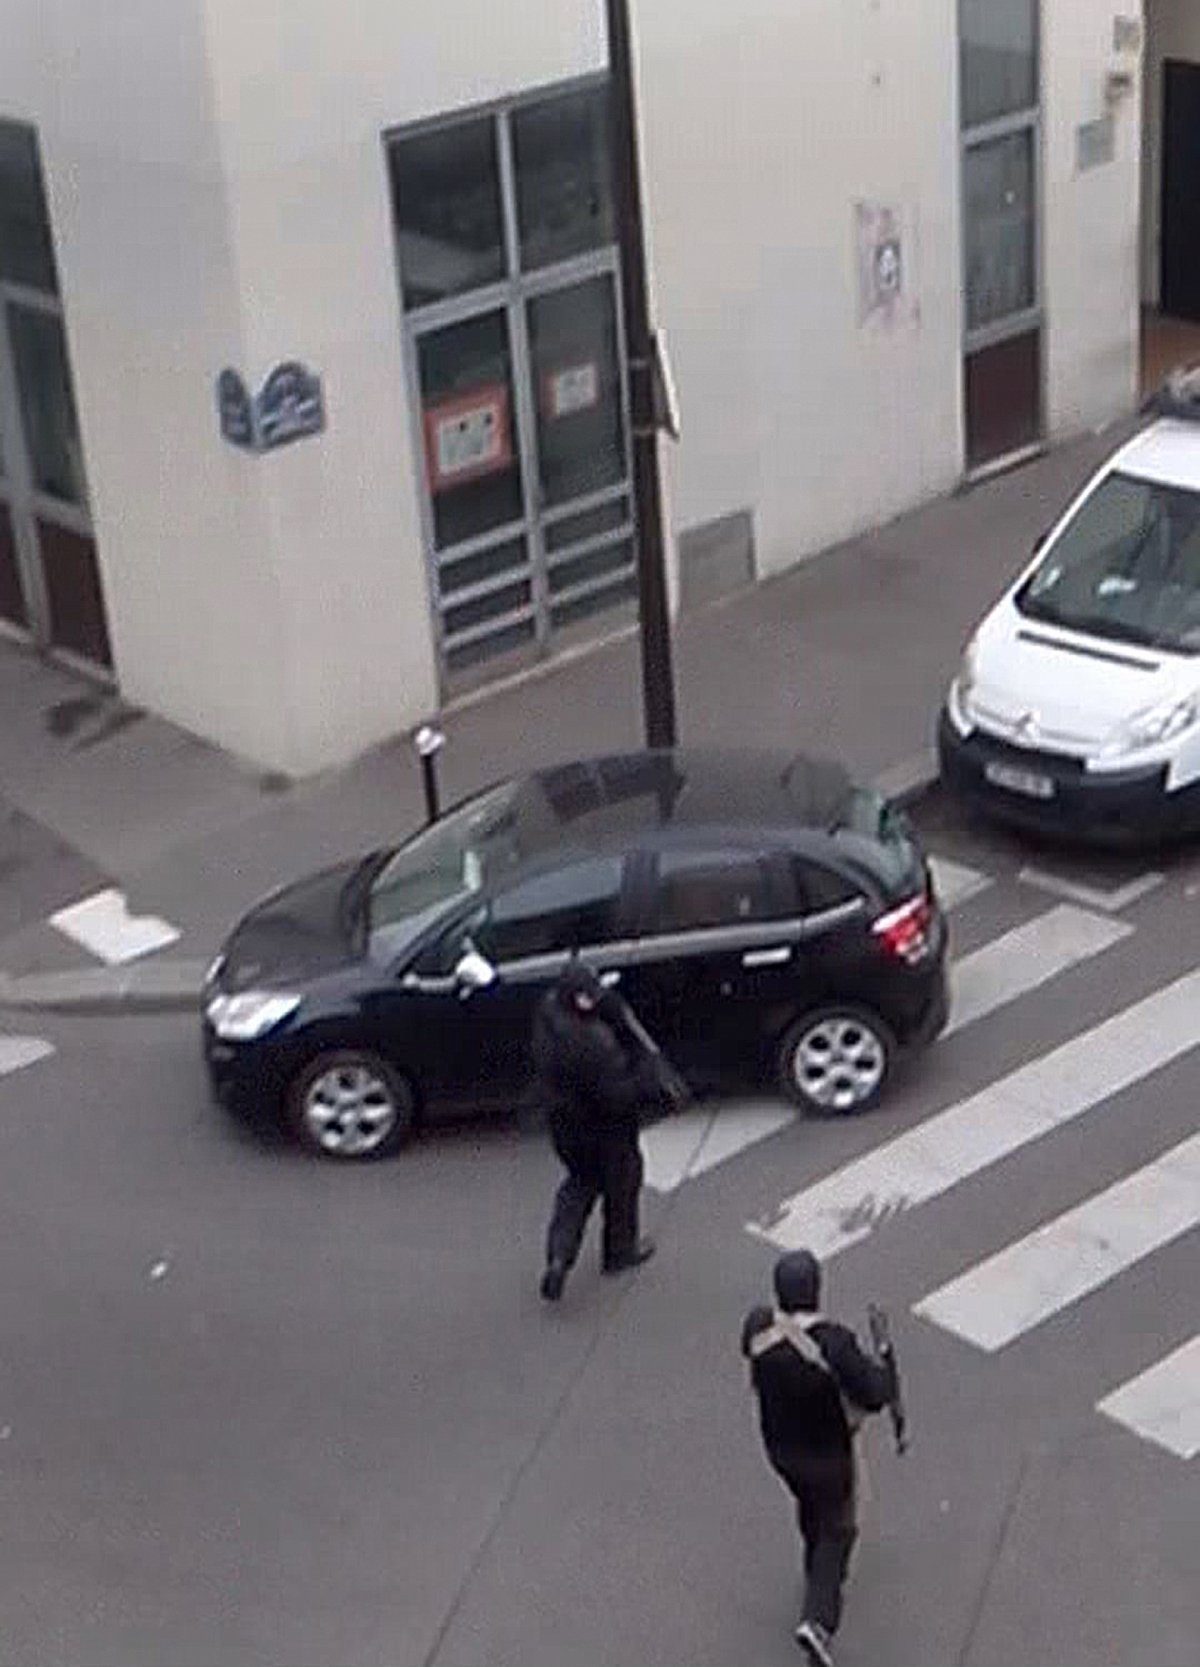 Gunmen return to their car